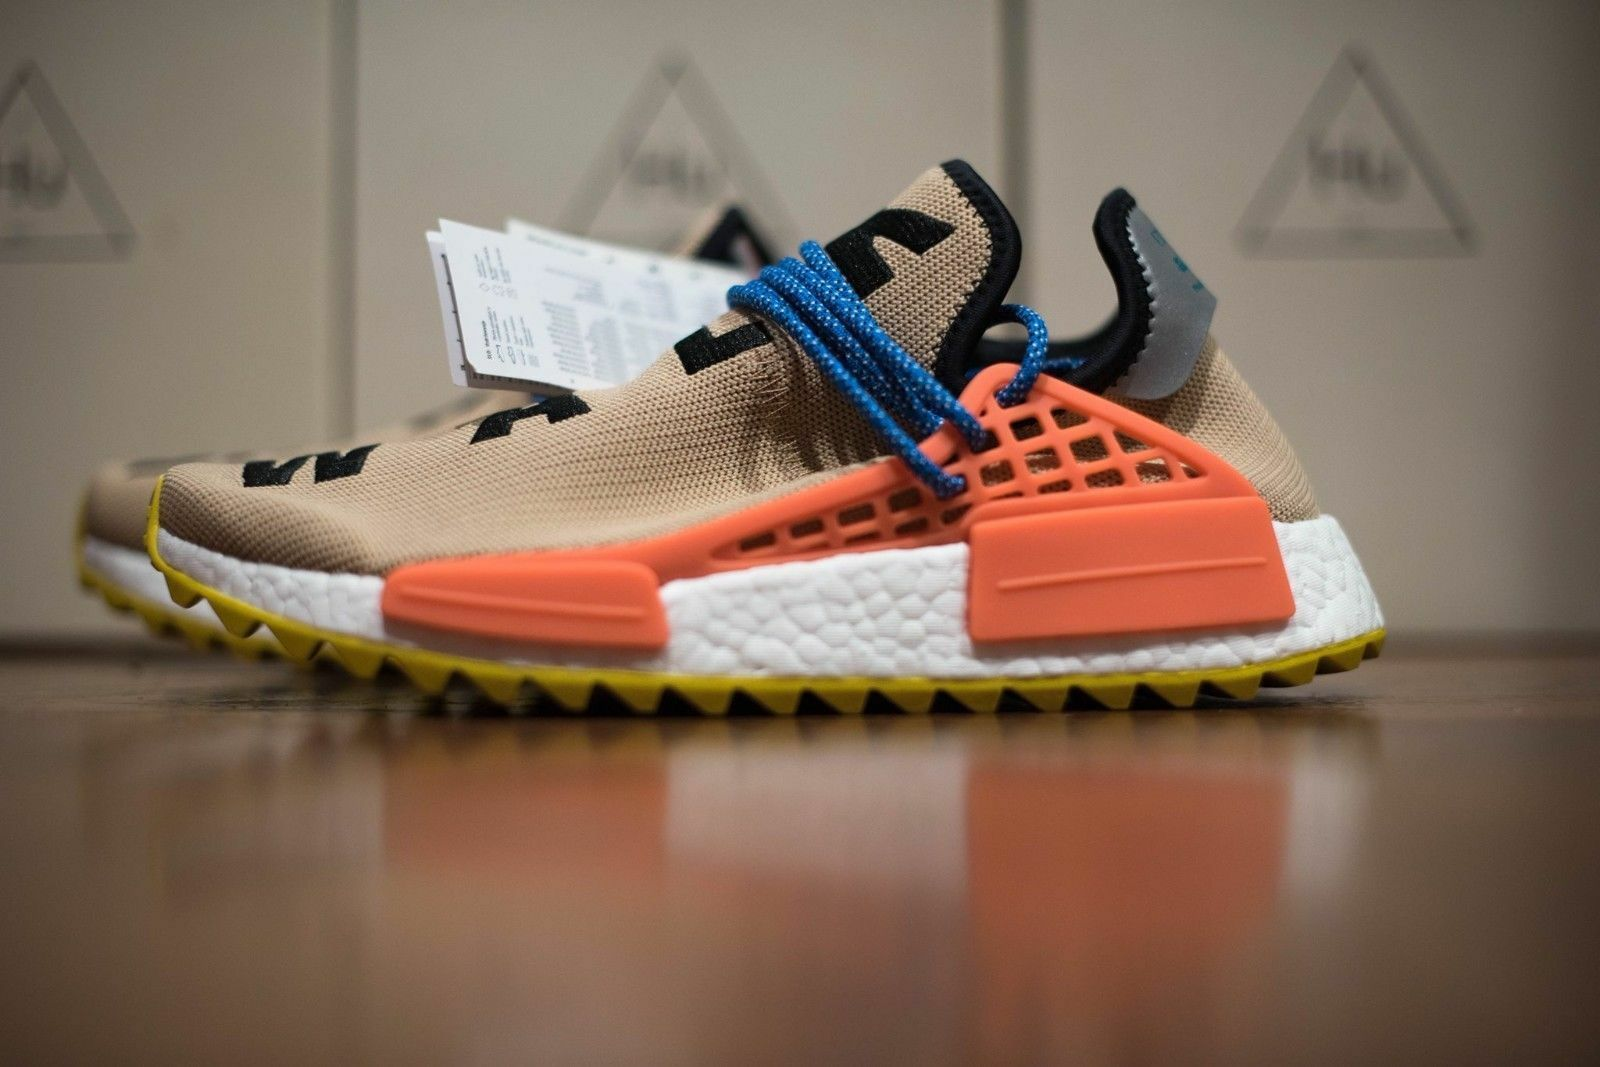 Adidas x pharrell williams hu nmd tr pale nude on foot look